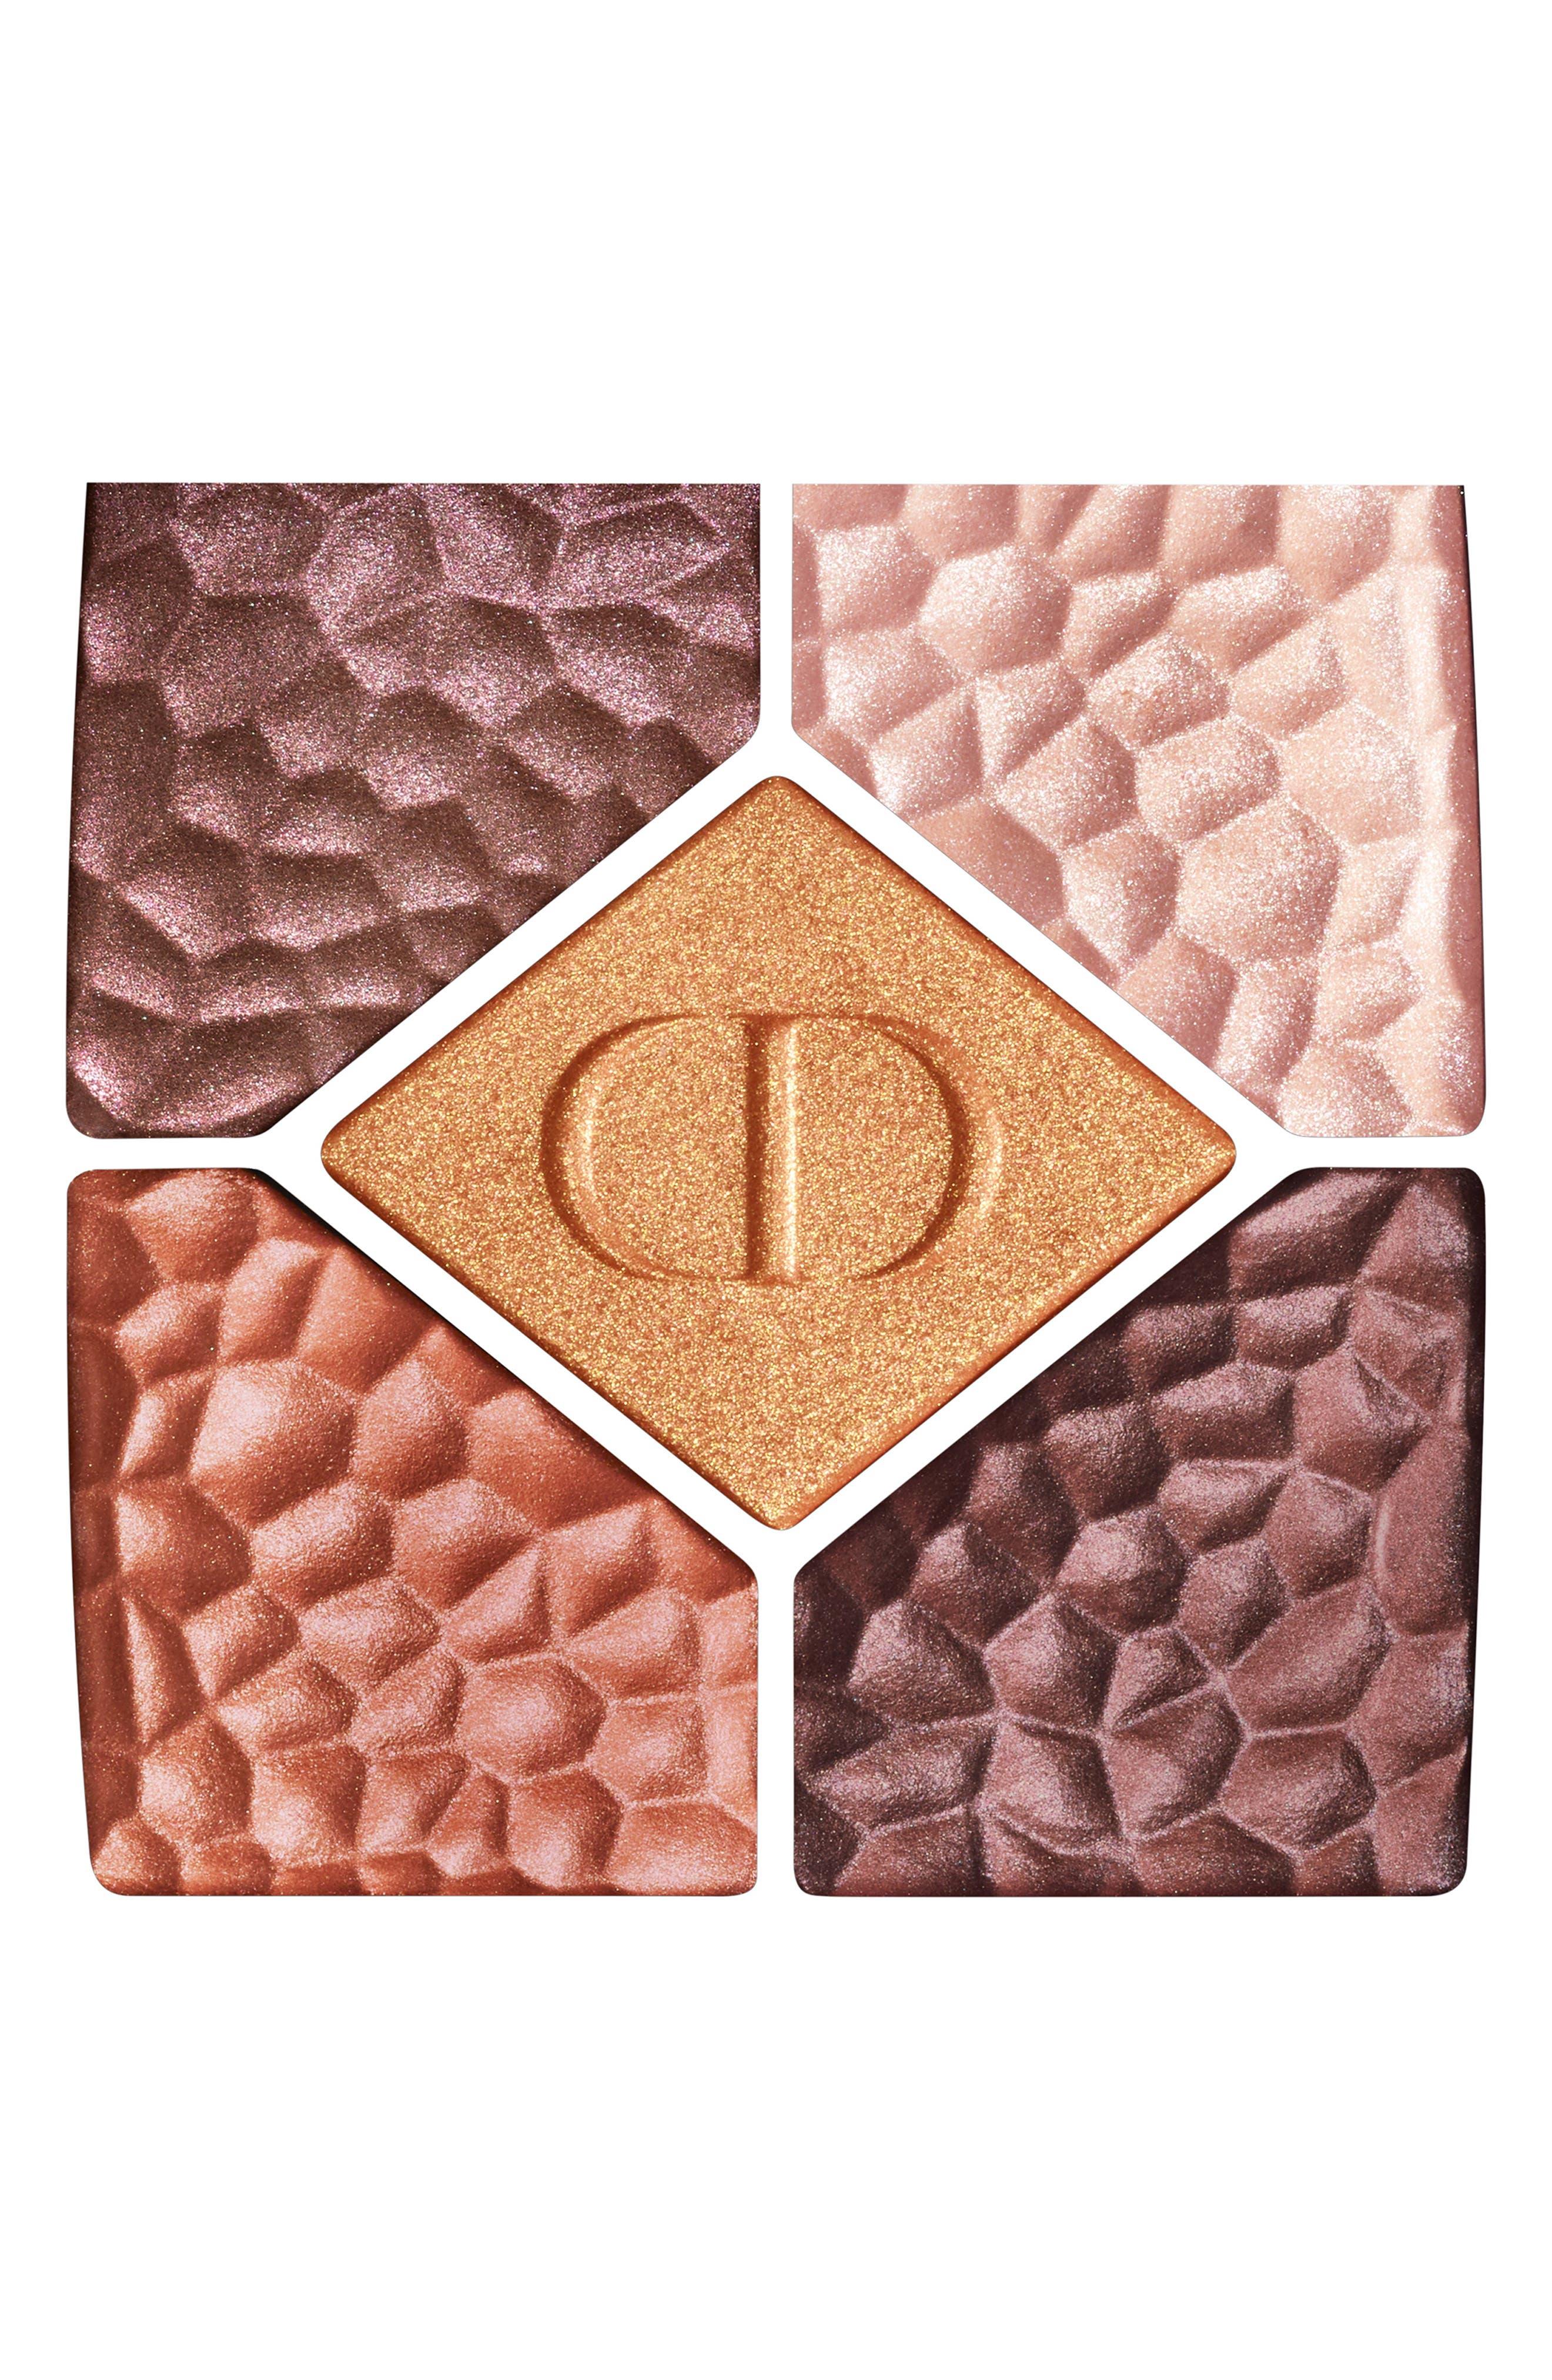 DIOR, Diorshow 5 Couleurs Colors & Effects Eyeshadow Palette, Alternate thumbnail 3, color, 786 TERRA